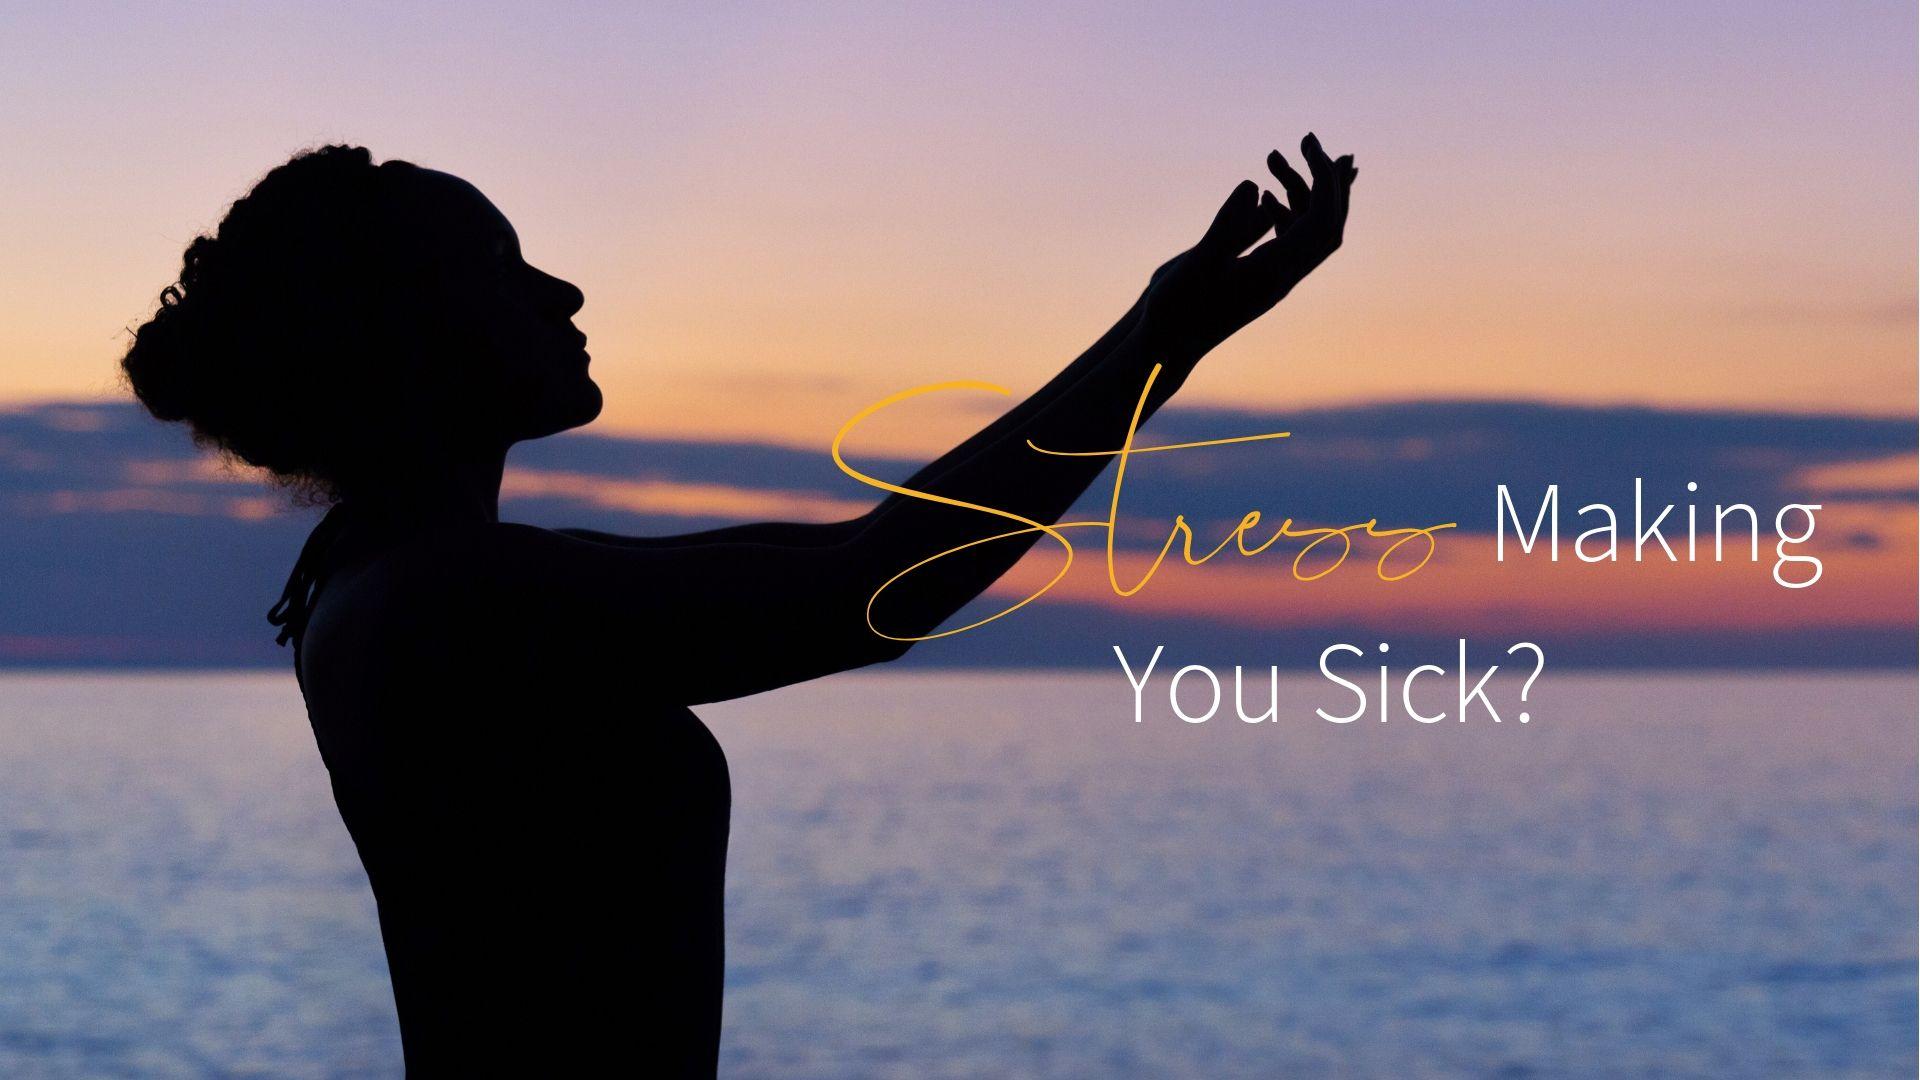 Stress Making you sick.jpg